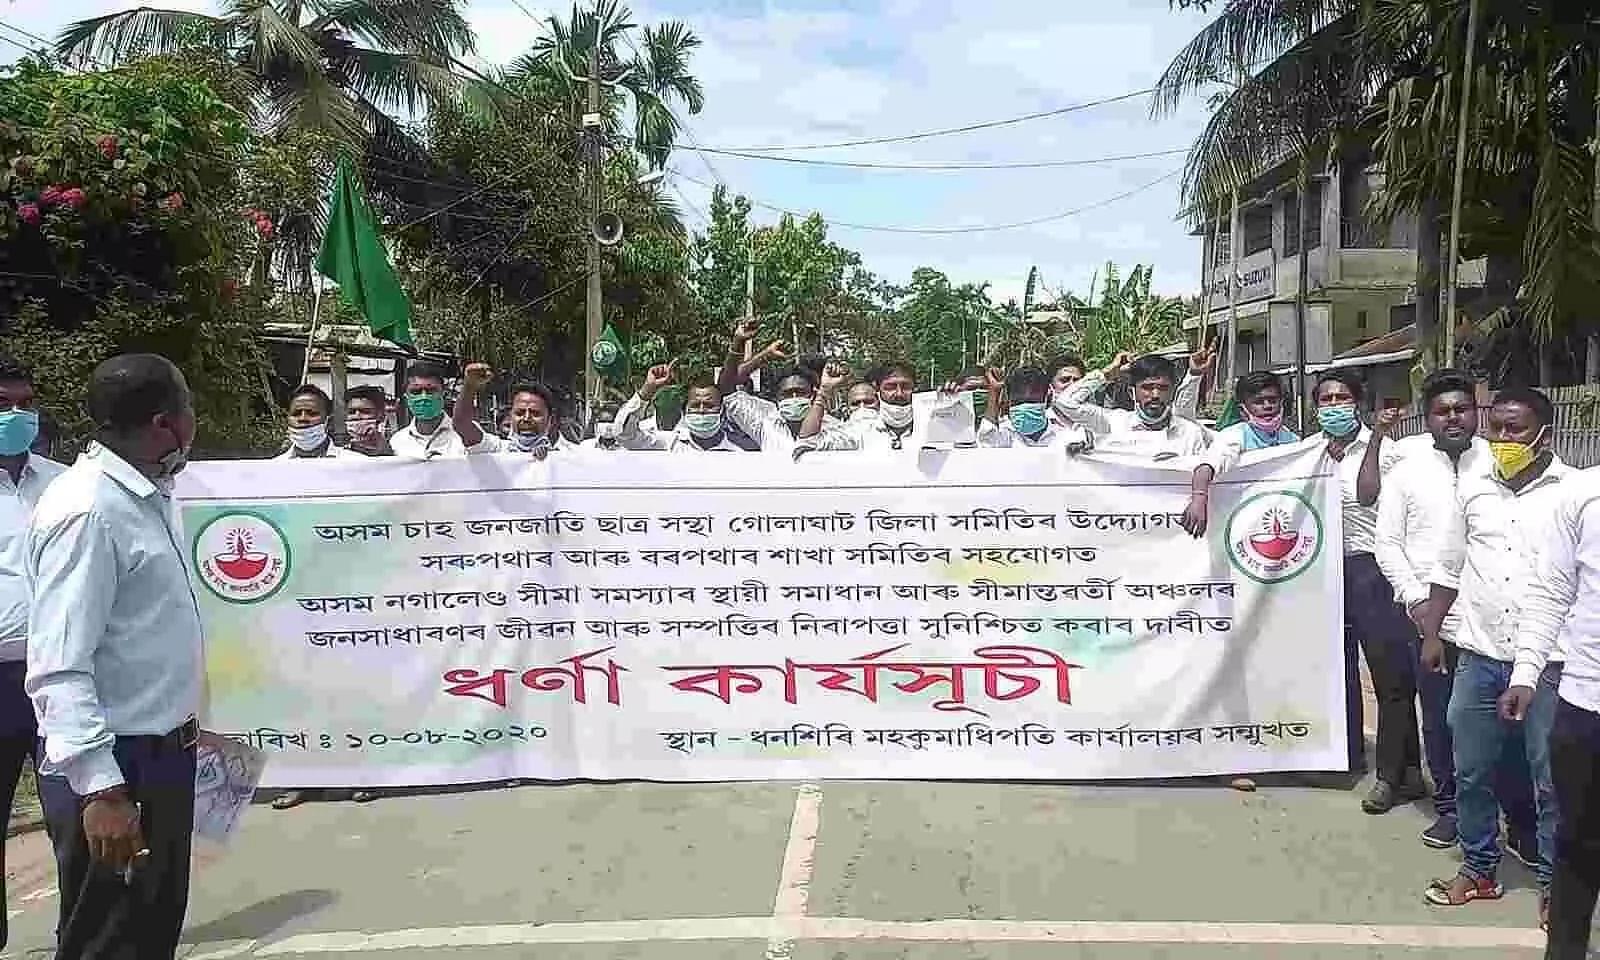 Massive protest by ATTSA over Assam-Nagaland border issue